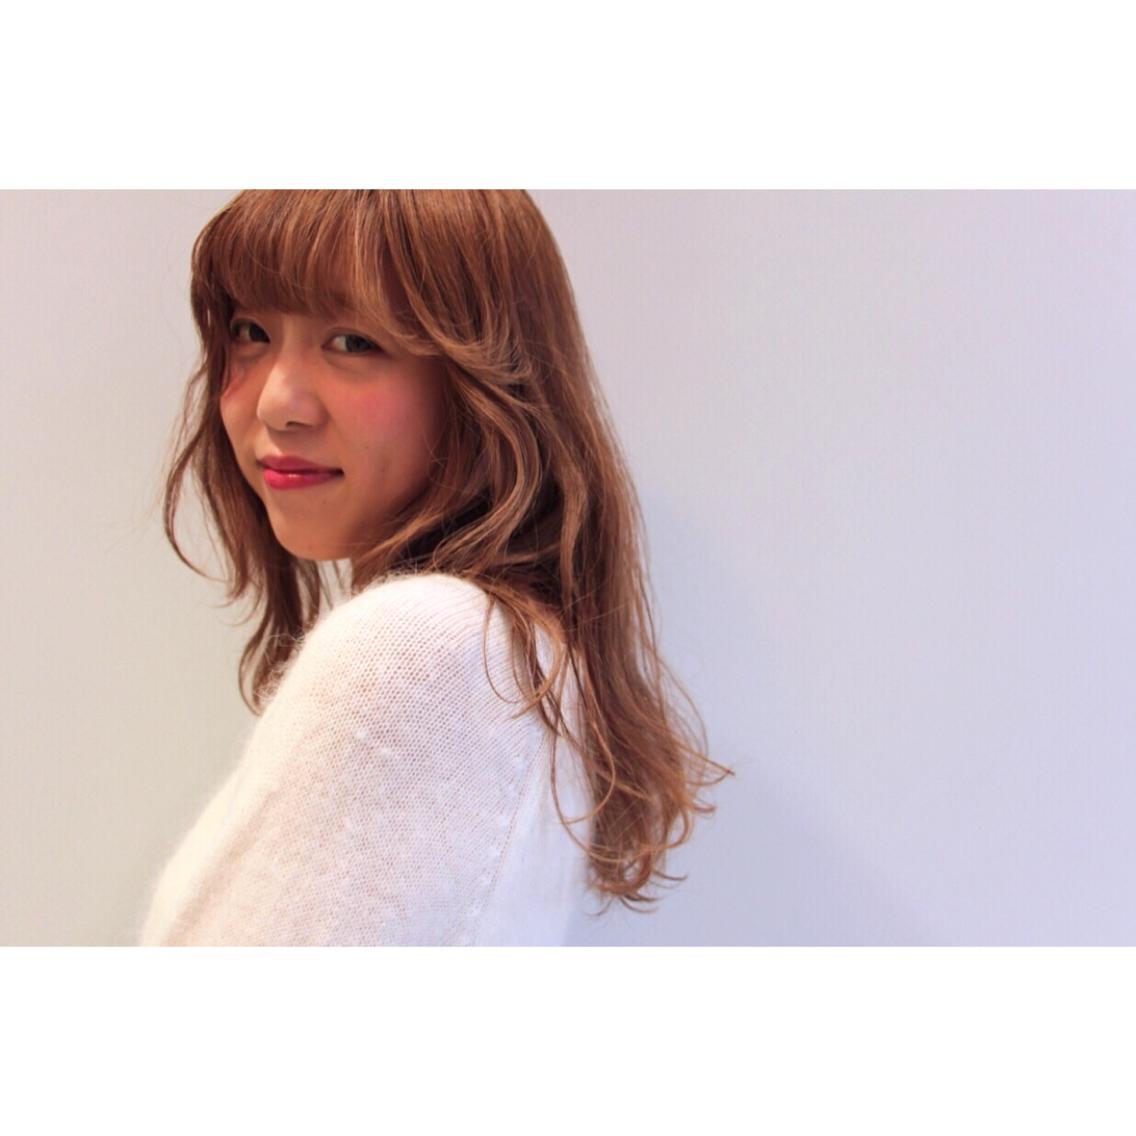 ❤︎ 伊勢崎 ❤︎ minimo限定 特別クーポン ❁